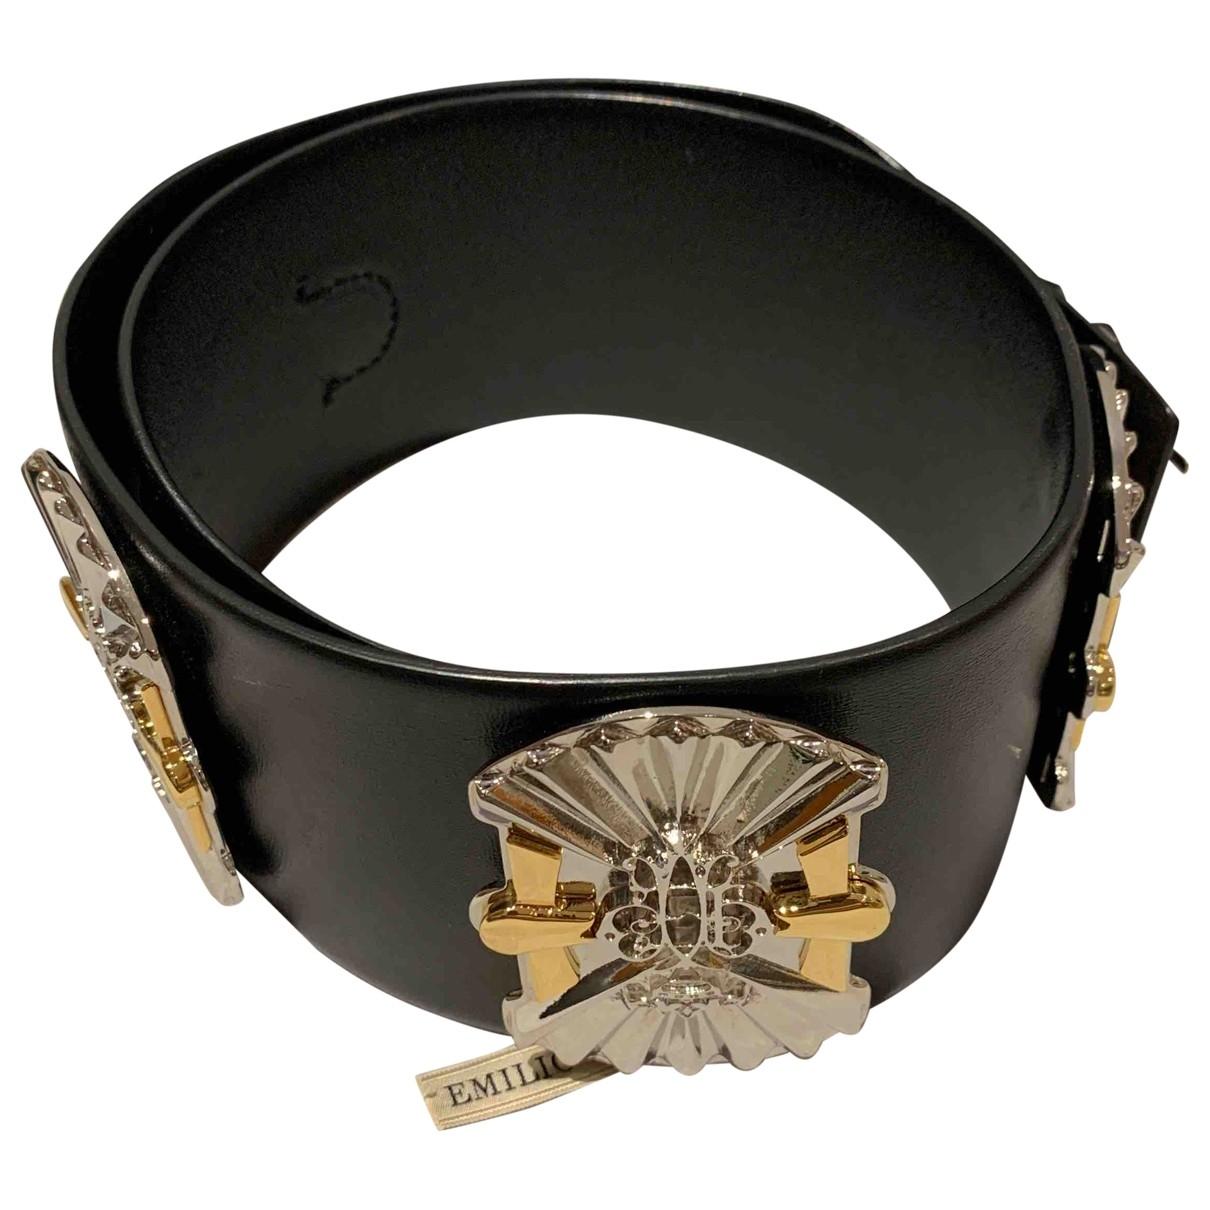 Emilio Pucci \N Black Leather belt for Women S International